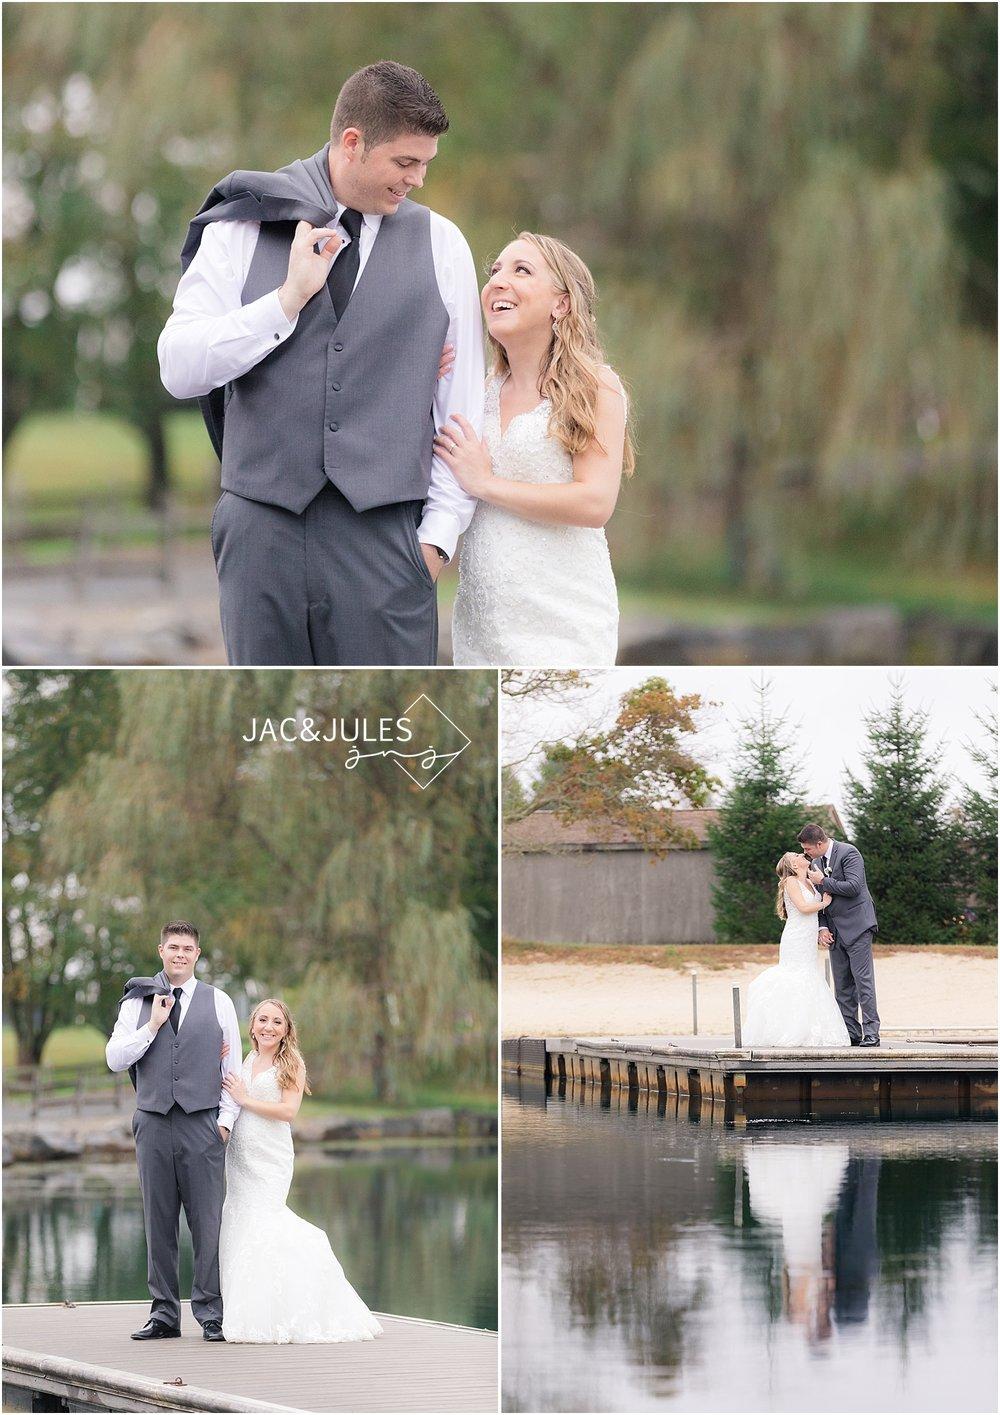 wedding photo on the dock at frogrbidge